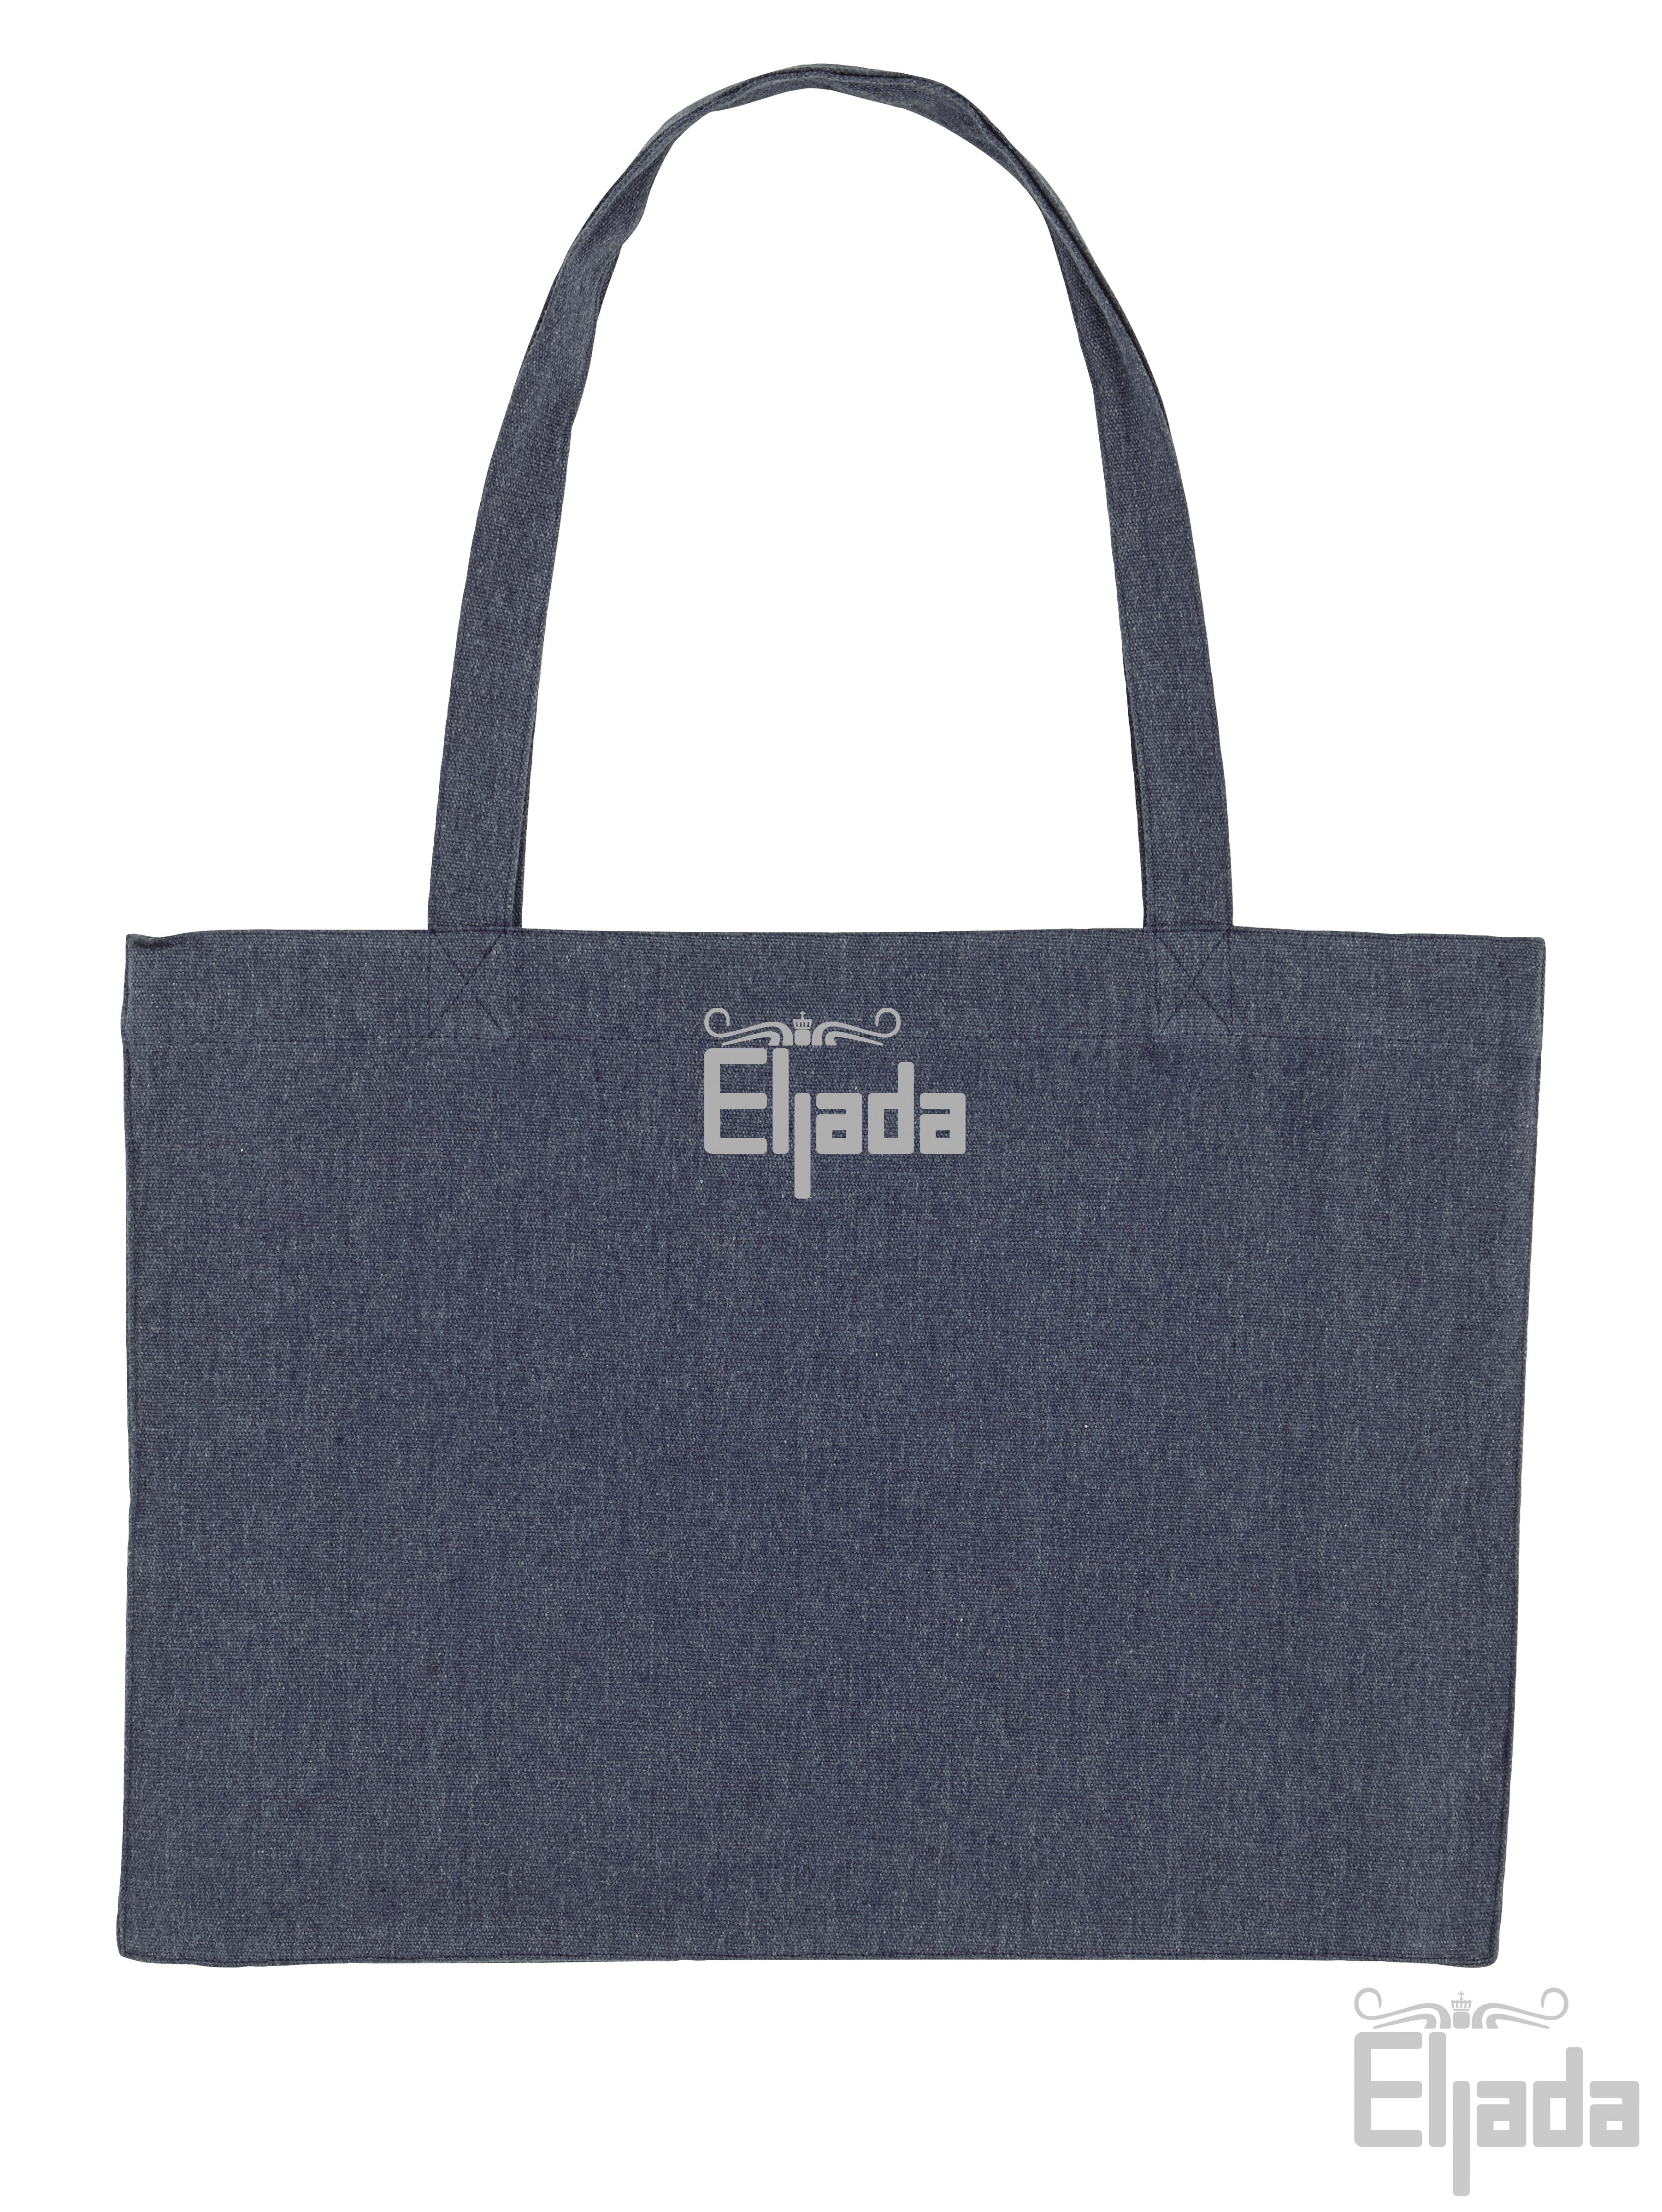 Heart bag from Eljada